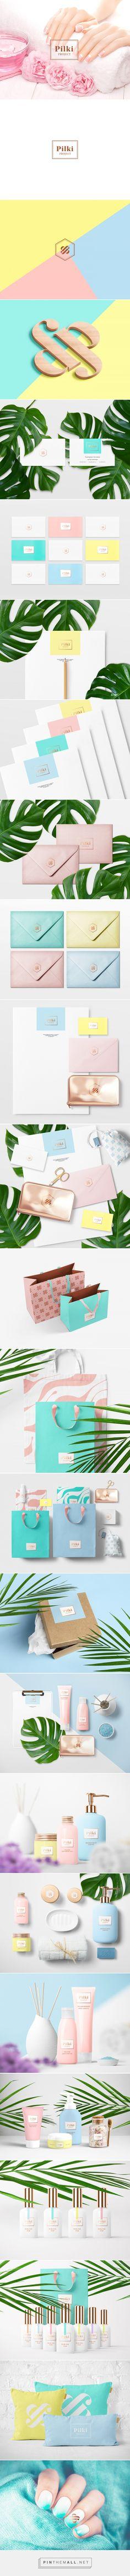 Pilki Project фирменный стиль для салона маникюра on Behance | Fivestar Branding – Design and Branding Agency & Inspiration Gallery